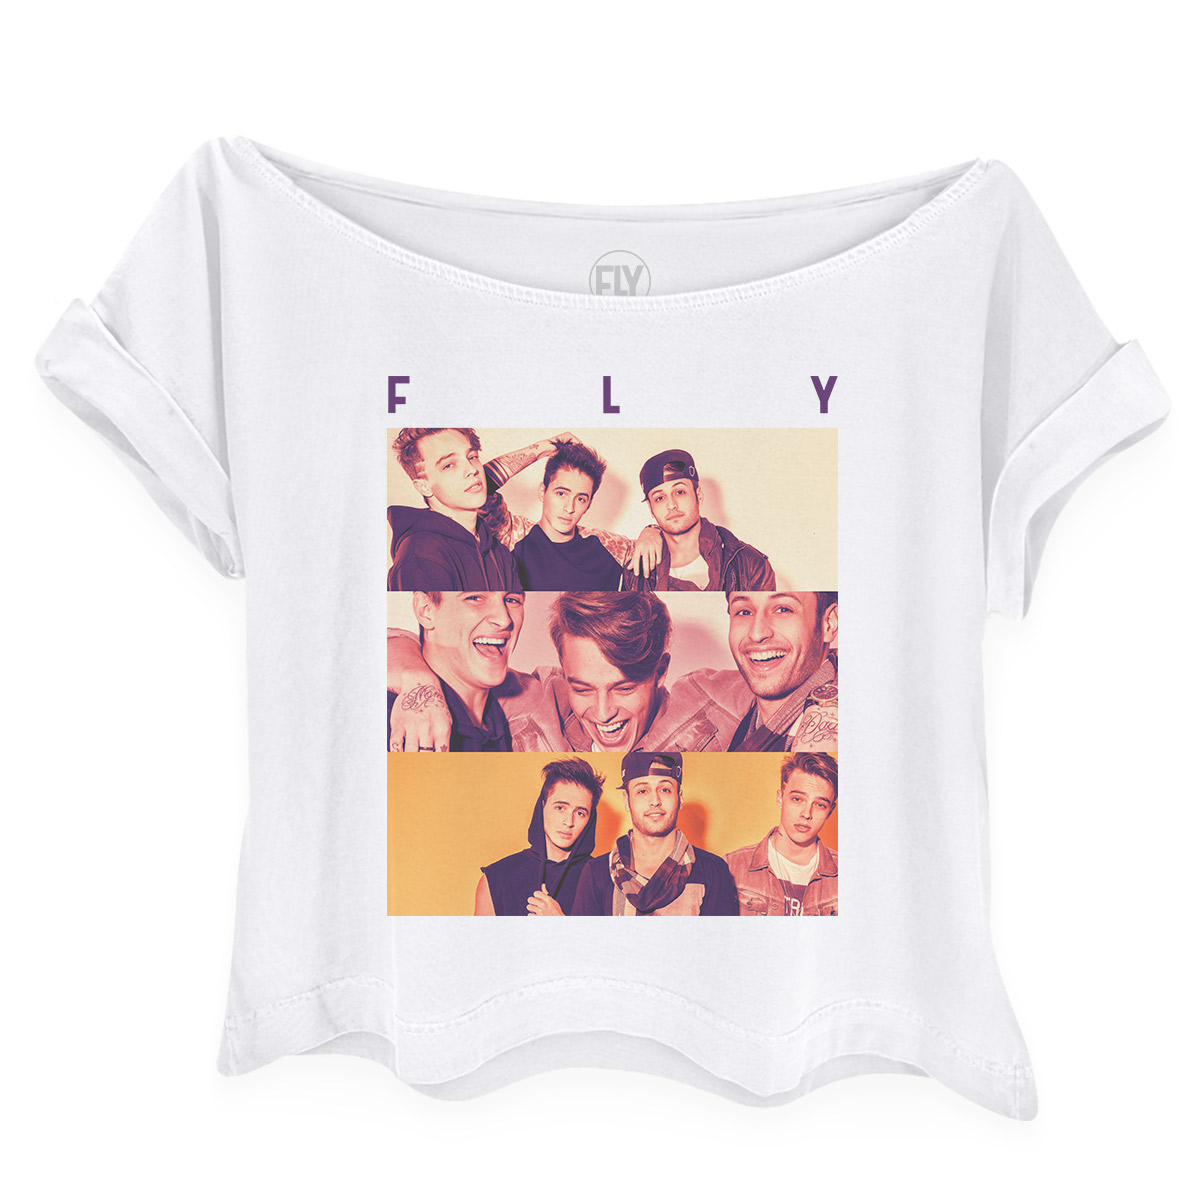 Camiseta Gola Canoa Banda Fly Especial 2 Anos